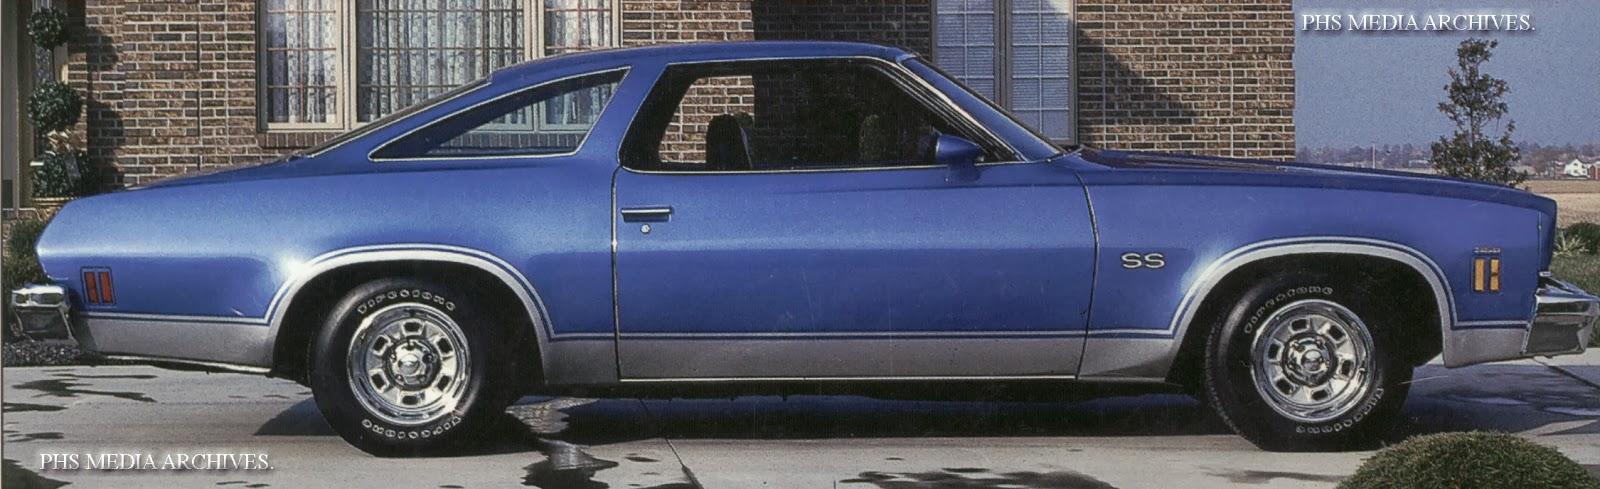 Chevelle Ss 73